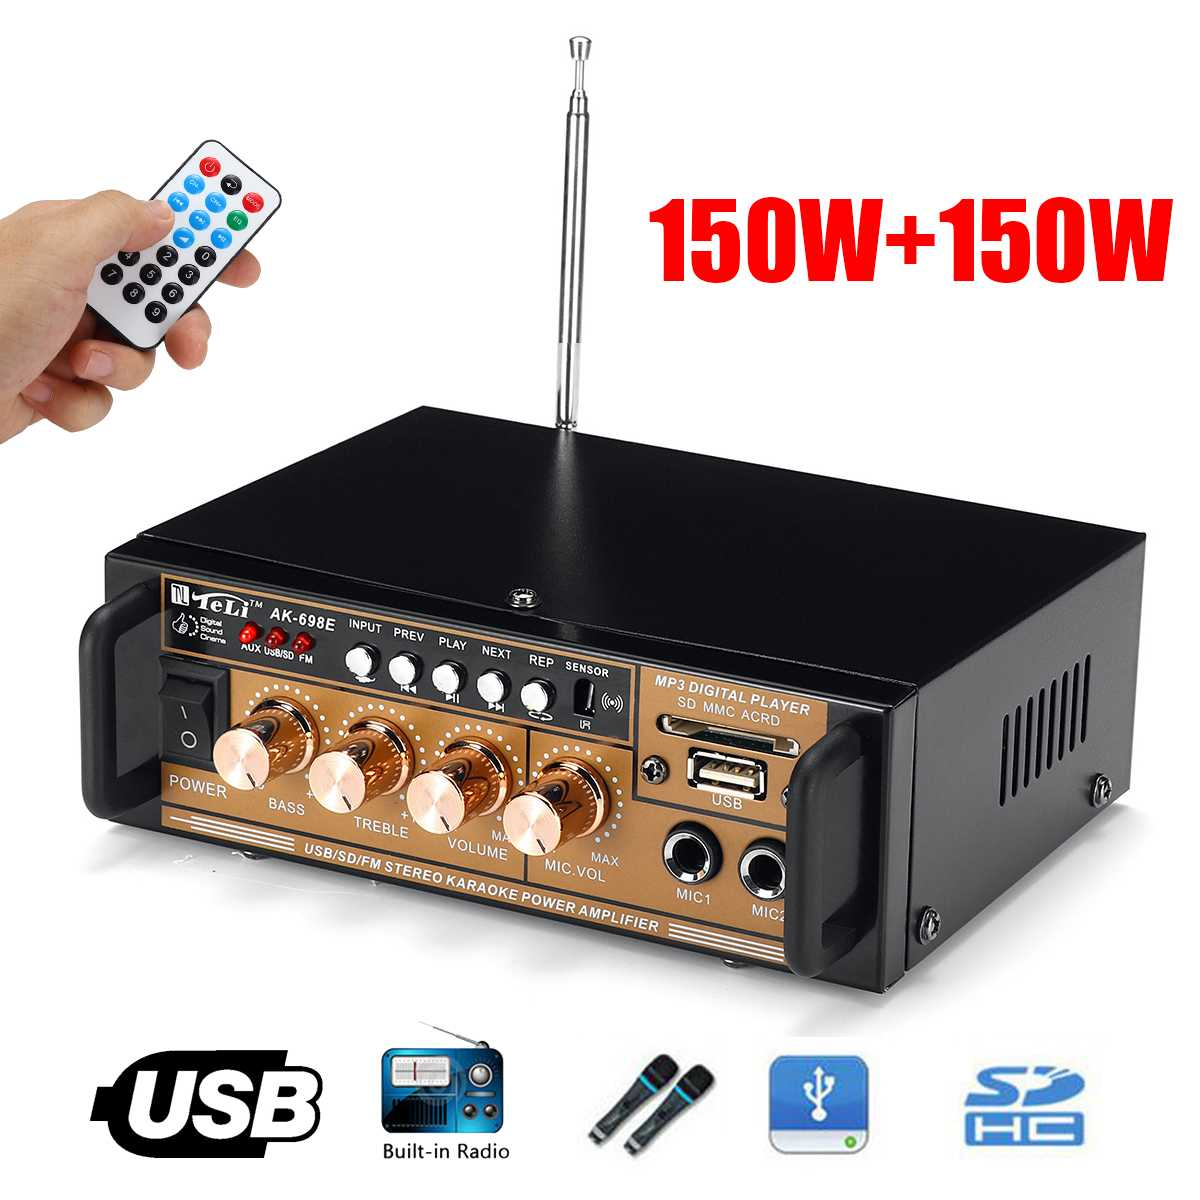 Portable 12V/ 220V 300W 2 Channel HIFI Audio Amplifier Mini Stereo Power Car Home Theater Amplifier FM Radio USB/TF Music Player